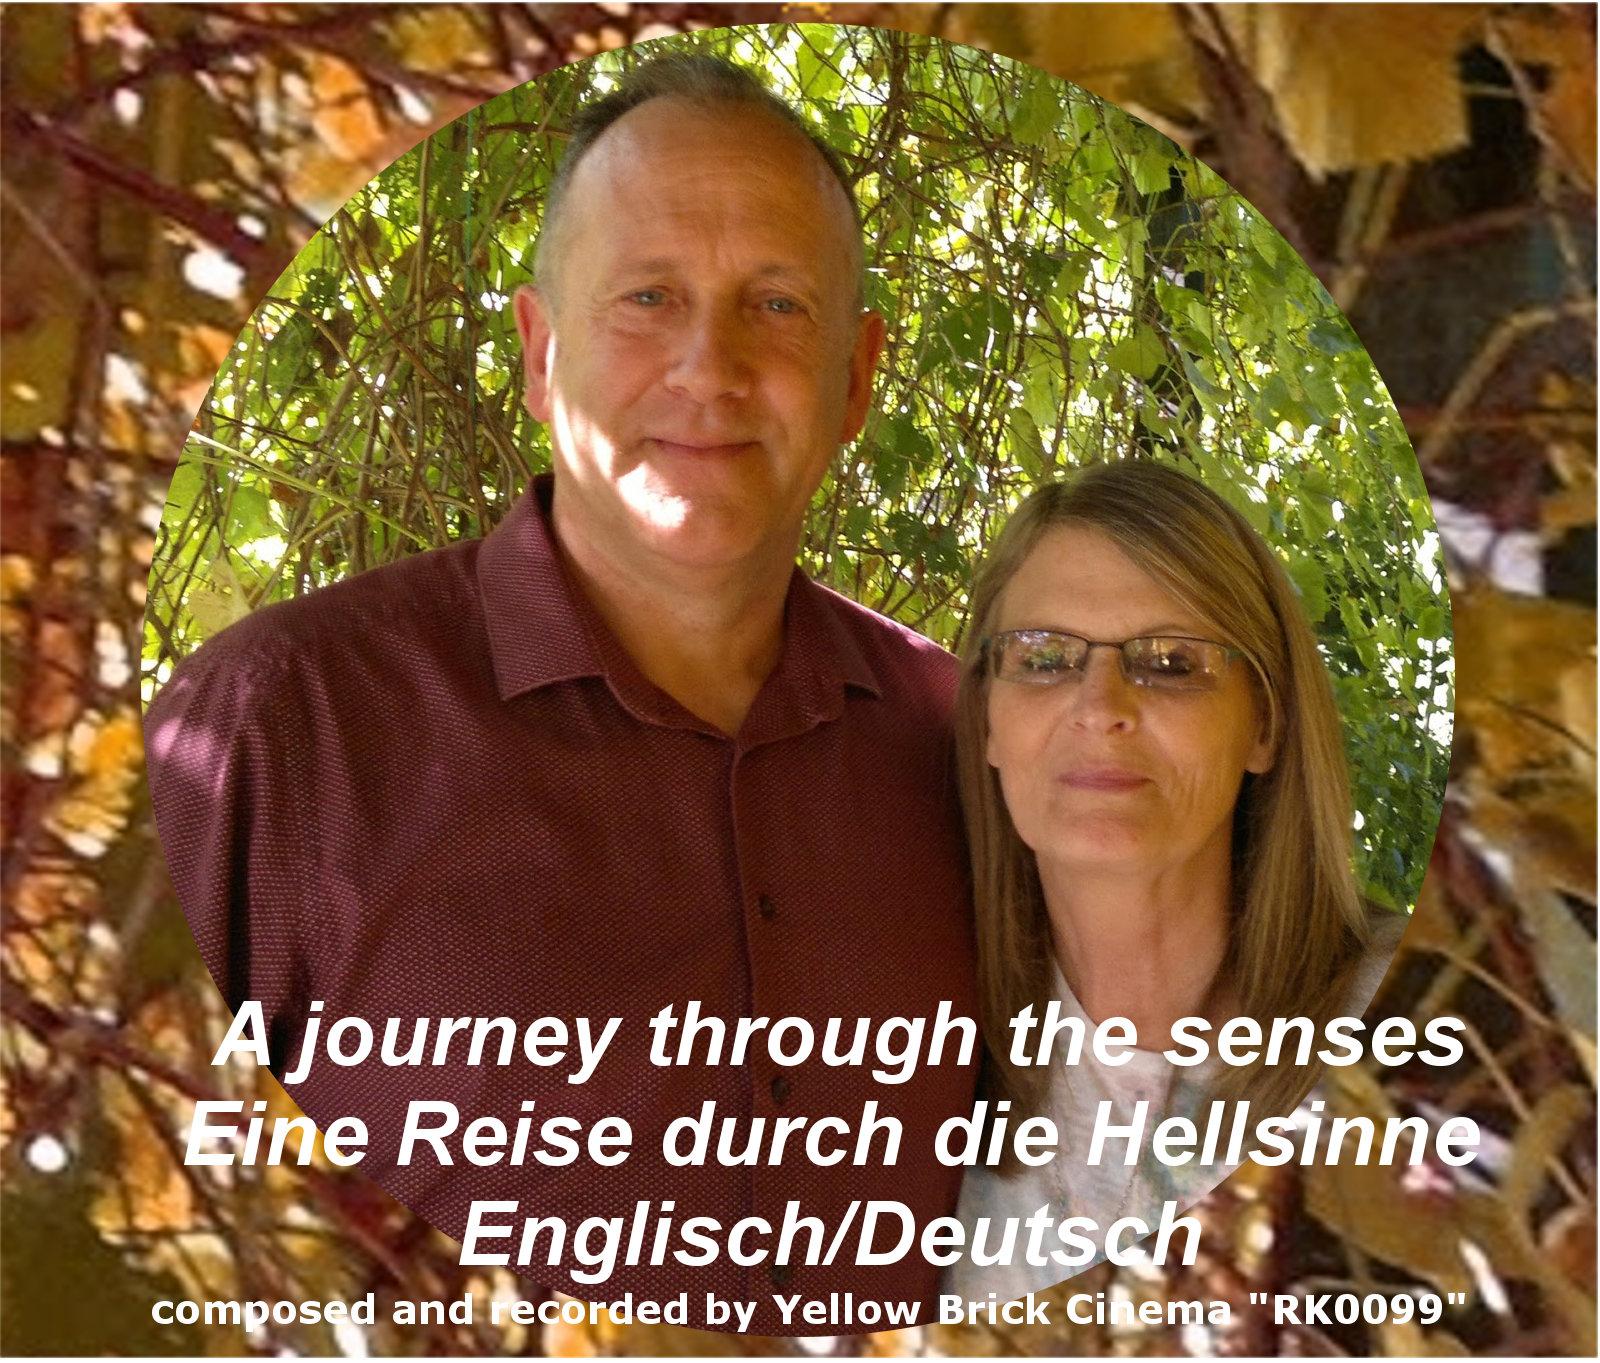 A Journey through the senses 00003